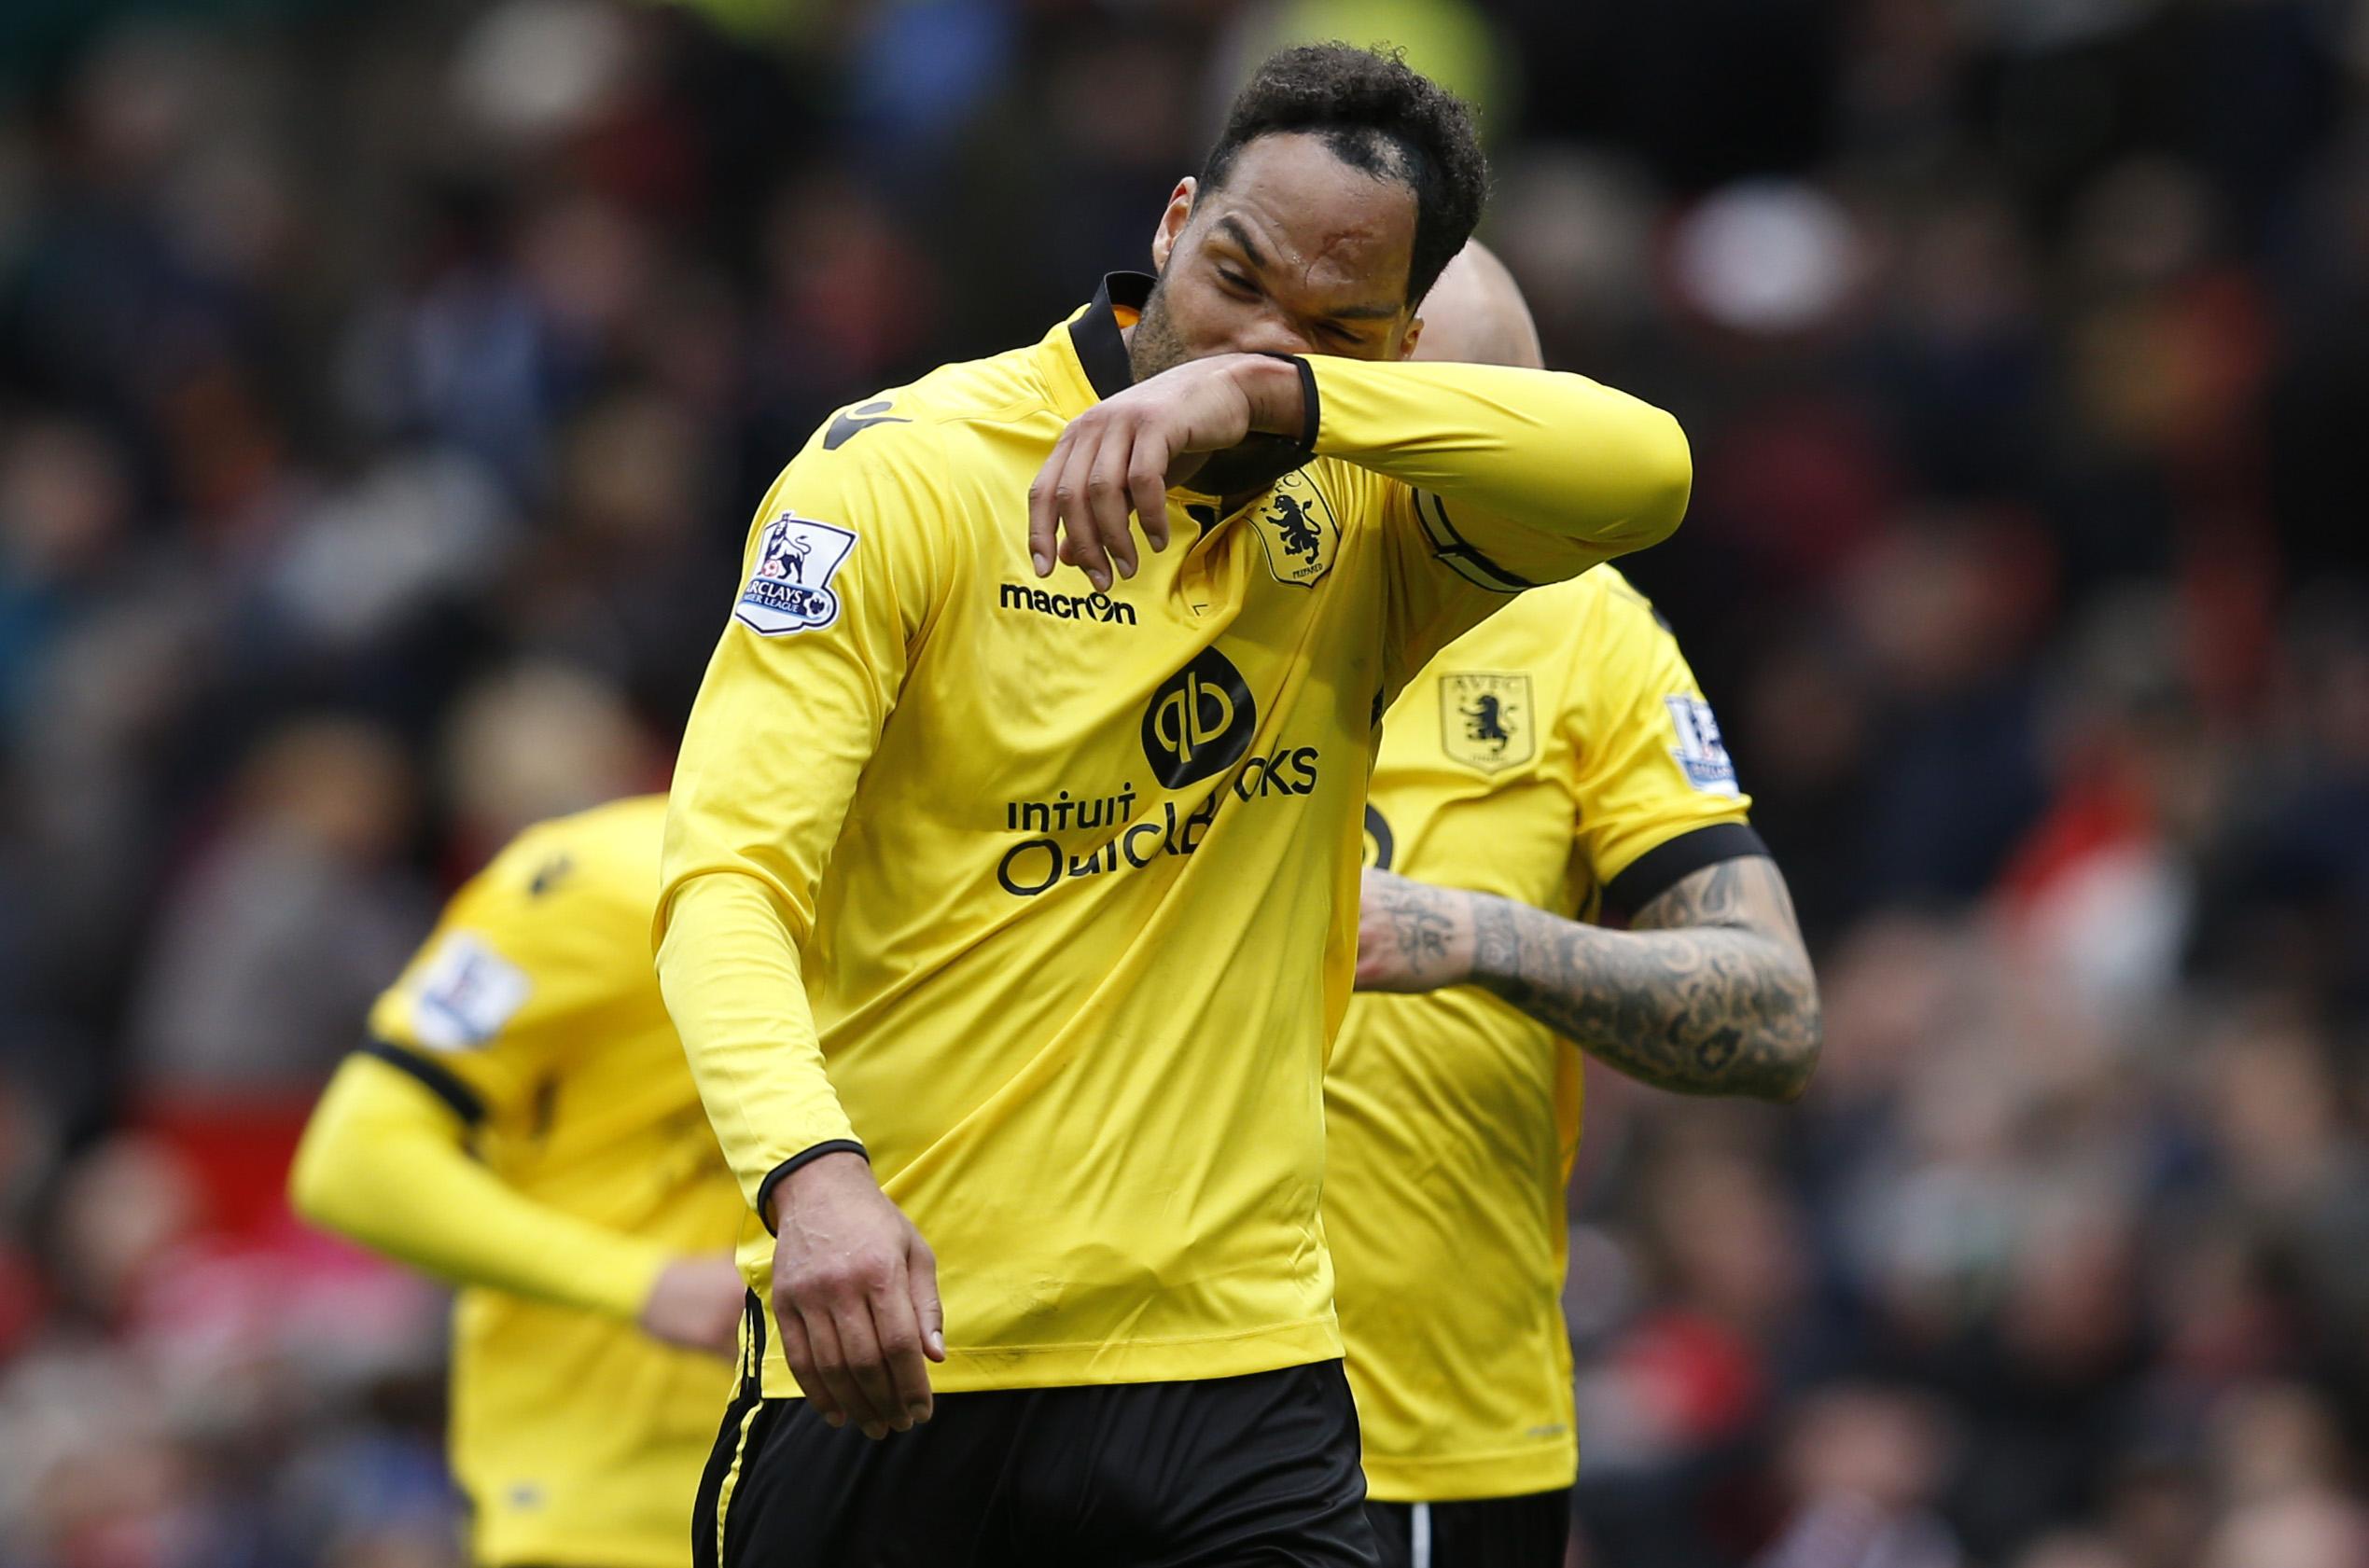 Villa relegated as Sunderland, Newcastle boost survival hopes